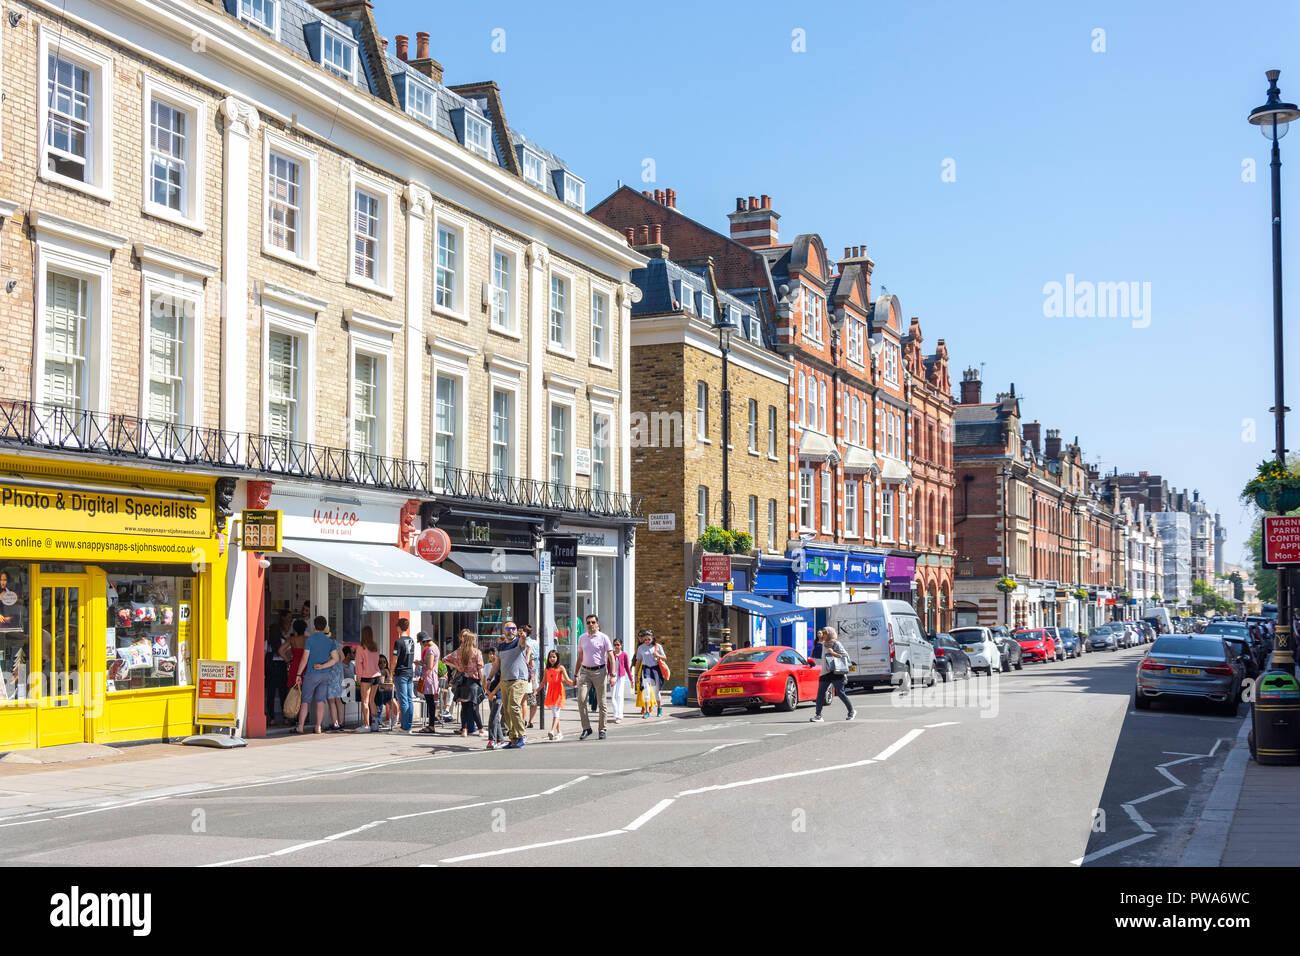 St John's Wood High Street, St John's Wood, City of Westminster, Greater London, England, United Kingdom - Stock Image